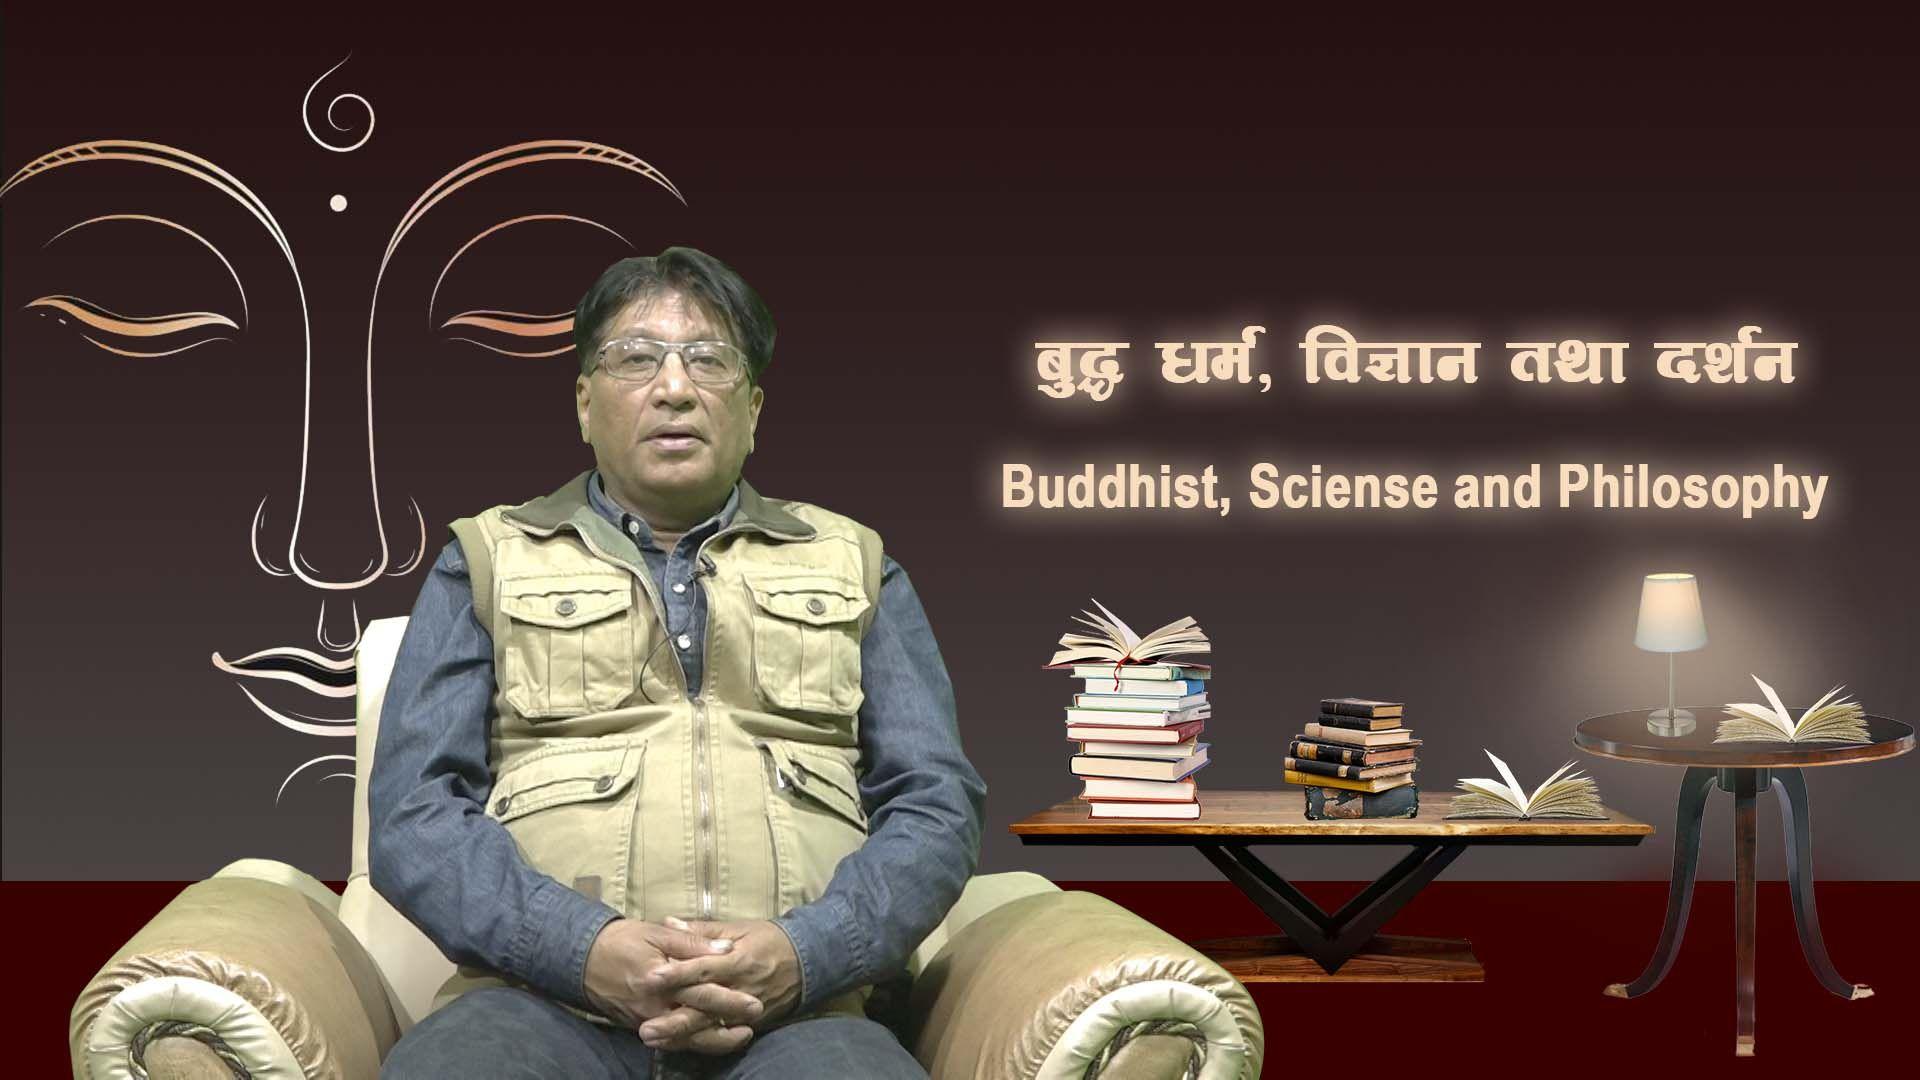 Buddhist, Science & Philosophy